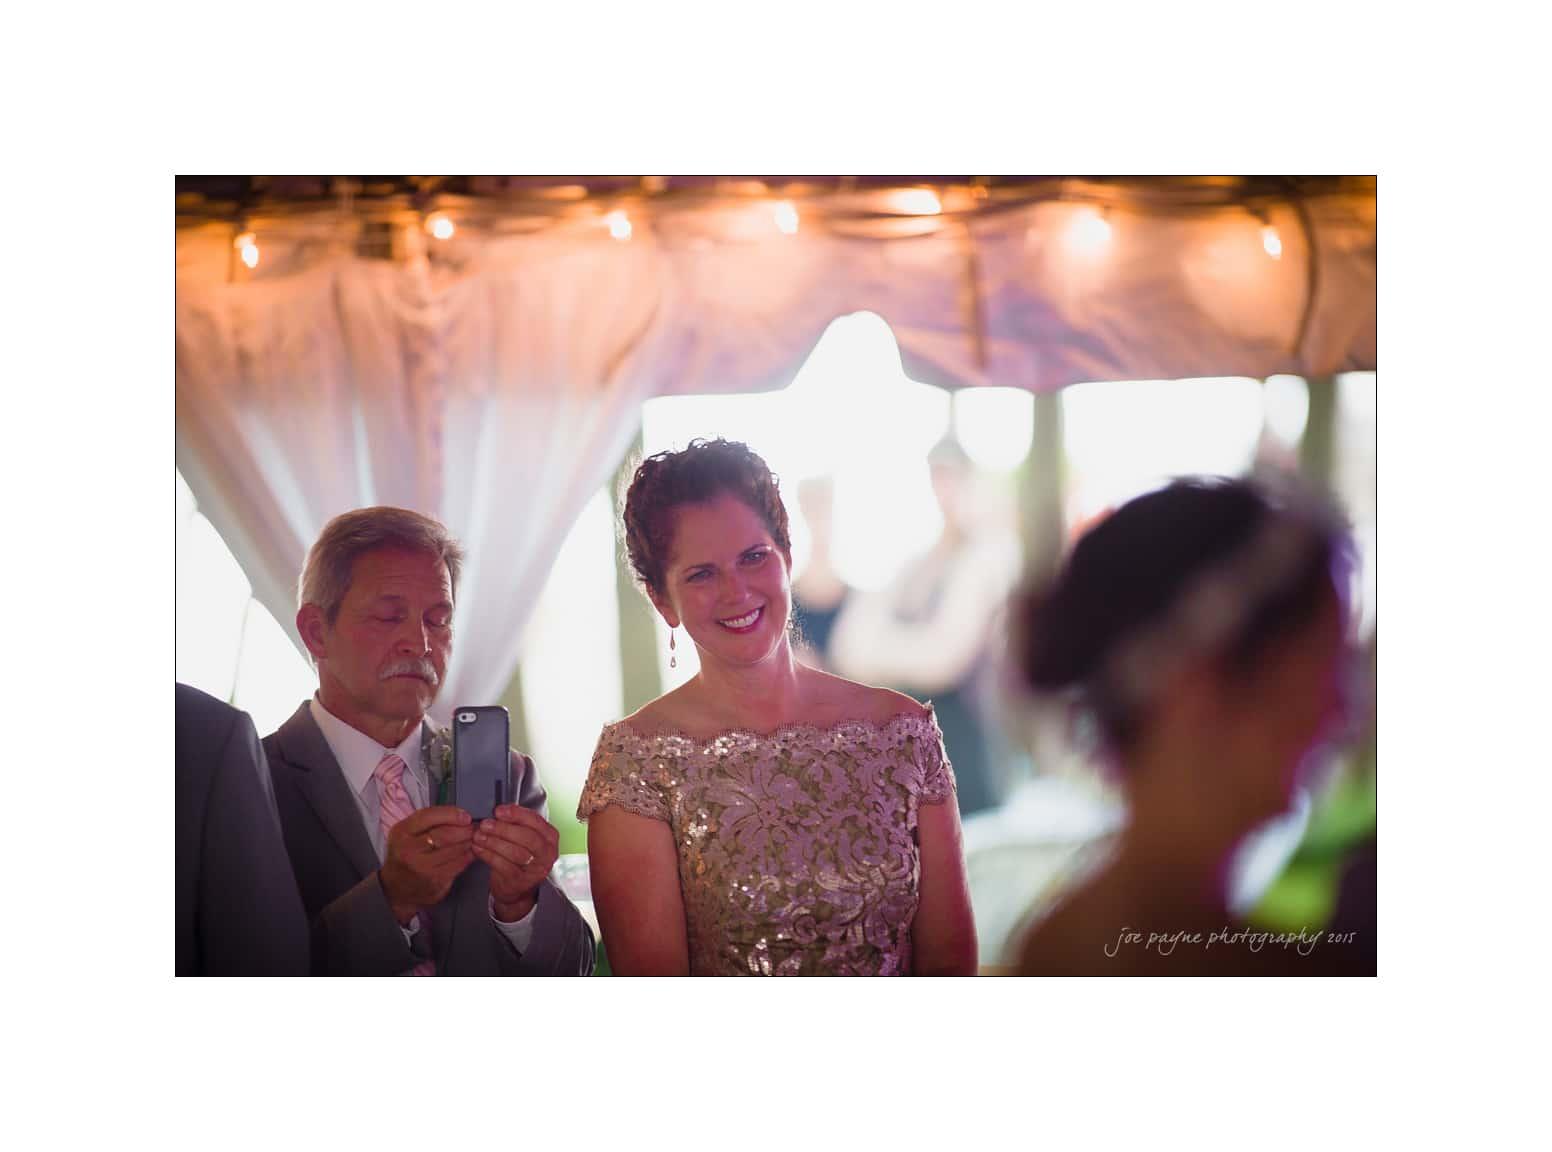 nc wedding photographer first dance emotional parents